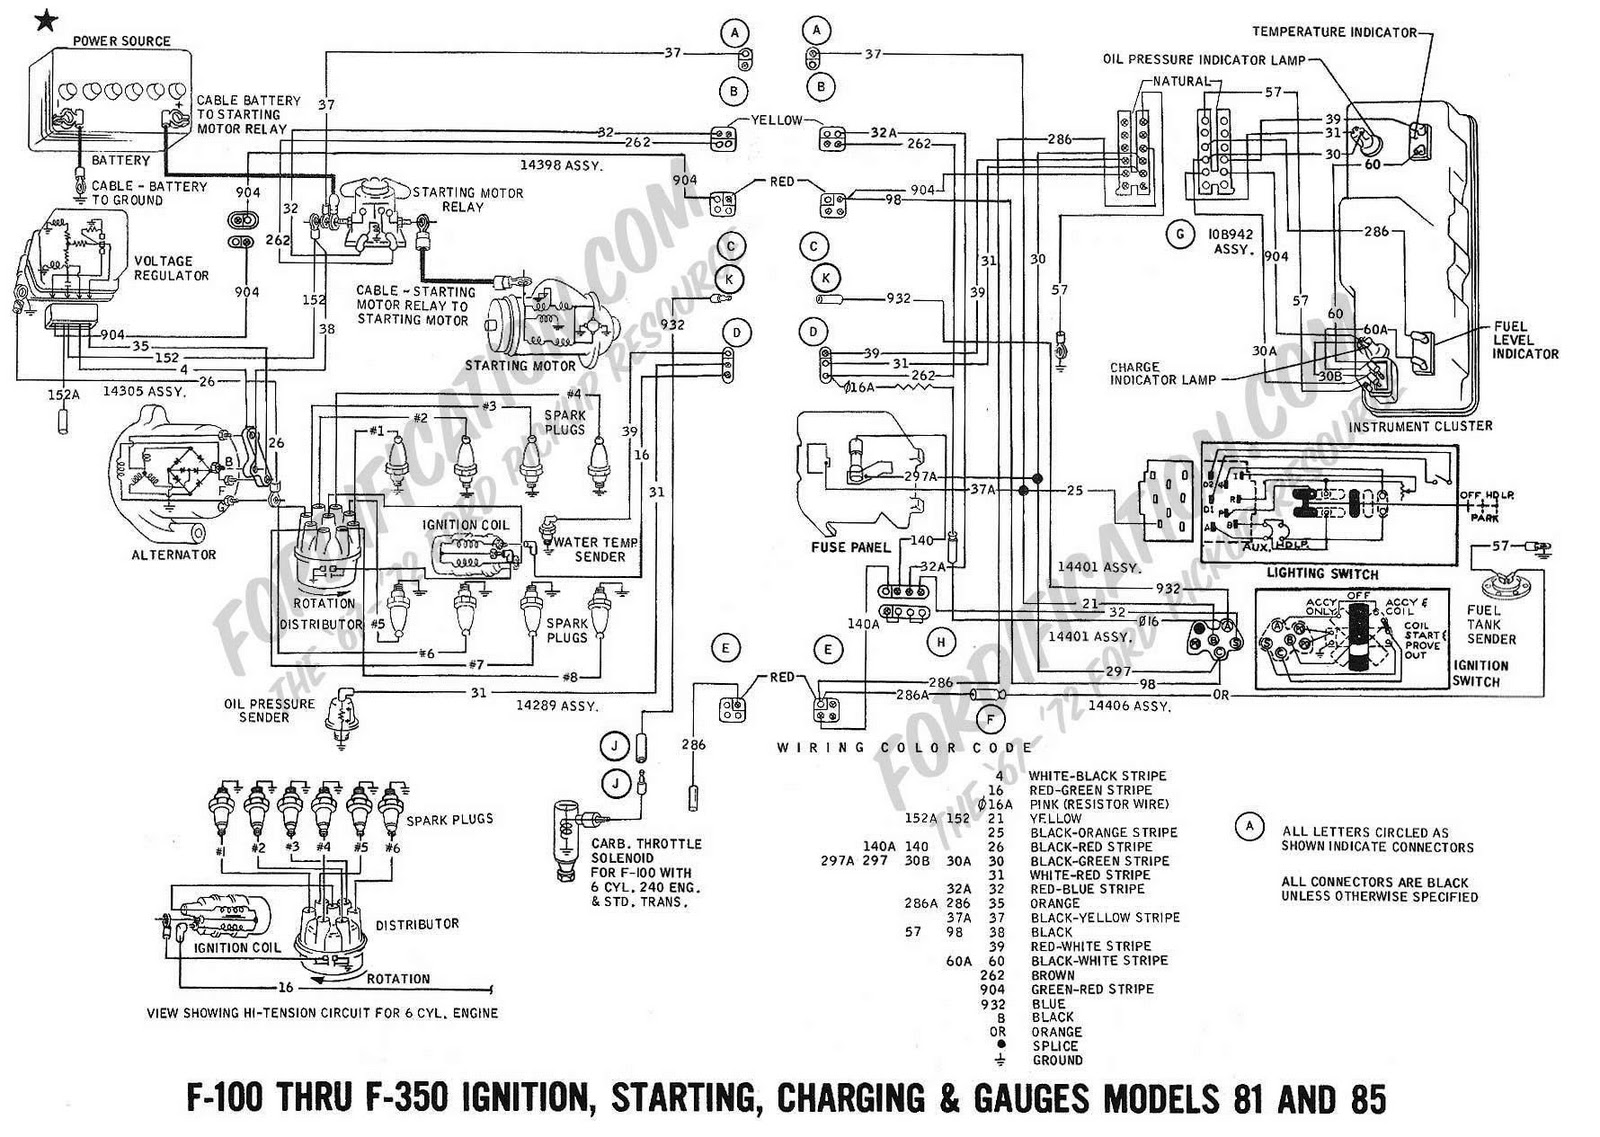 Unusual 1969 Camaro Ignition Switch Wiring Diagram Ideas ...